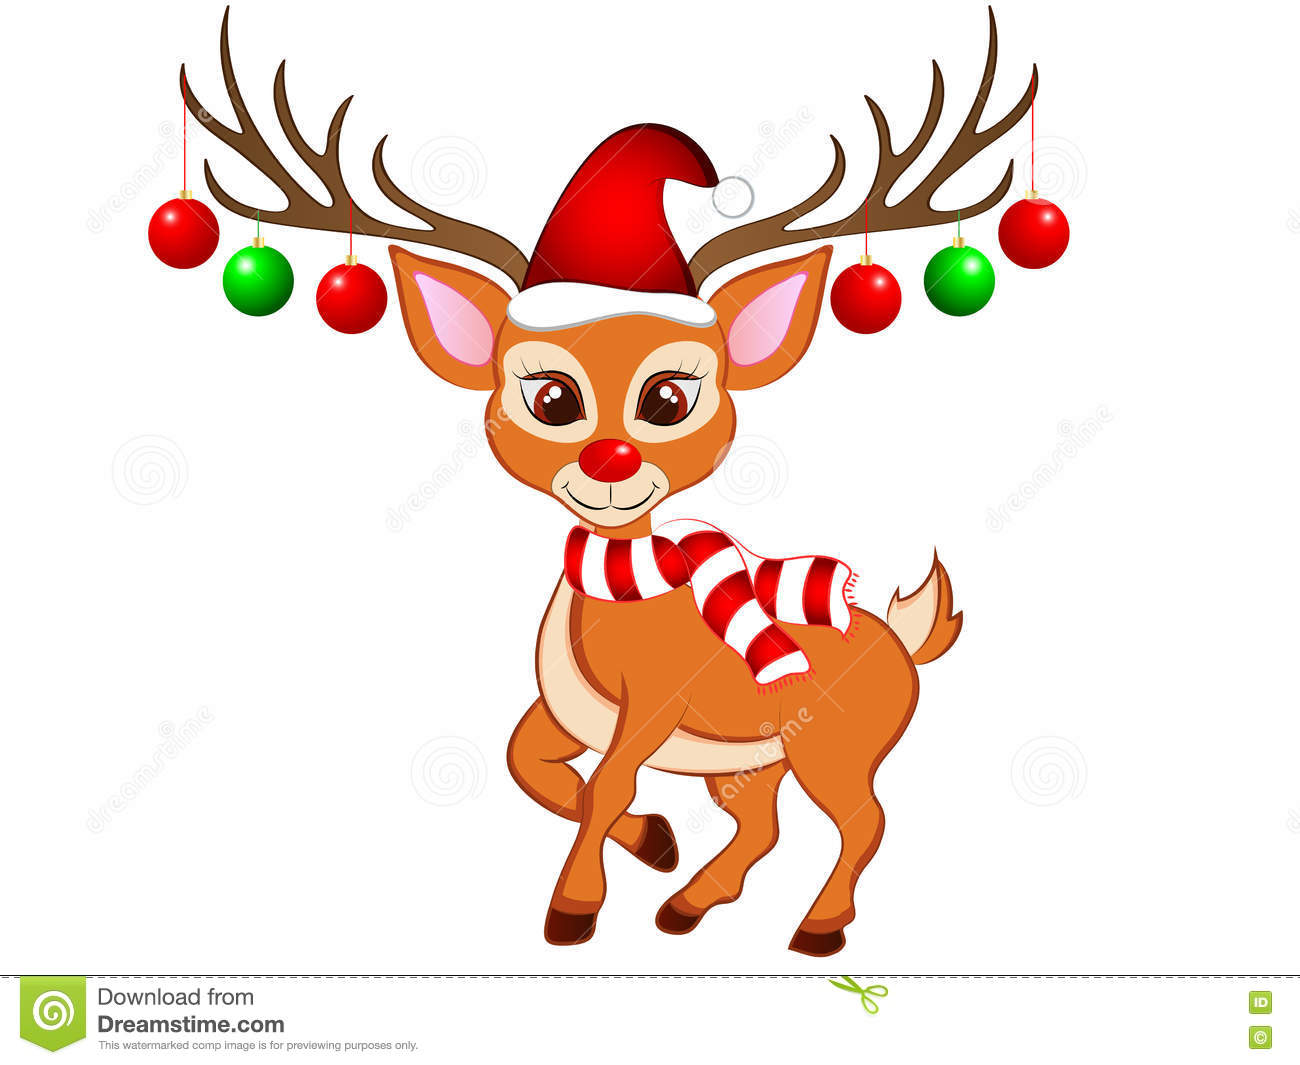 Cartoon Christmas Reindeer stock image. Illustration of reindeer.